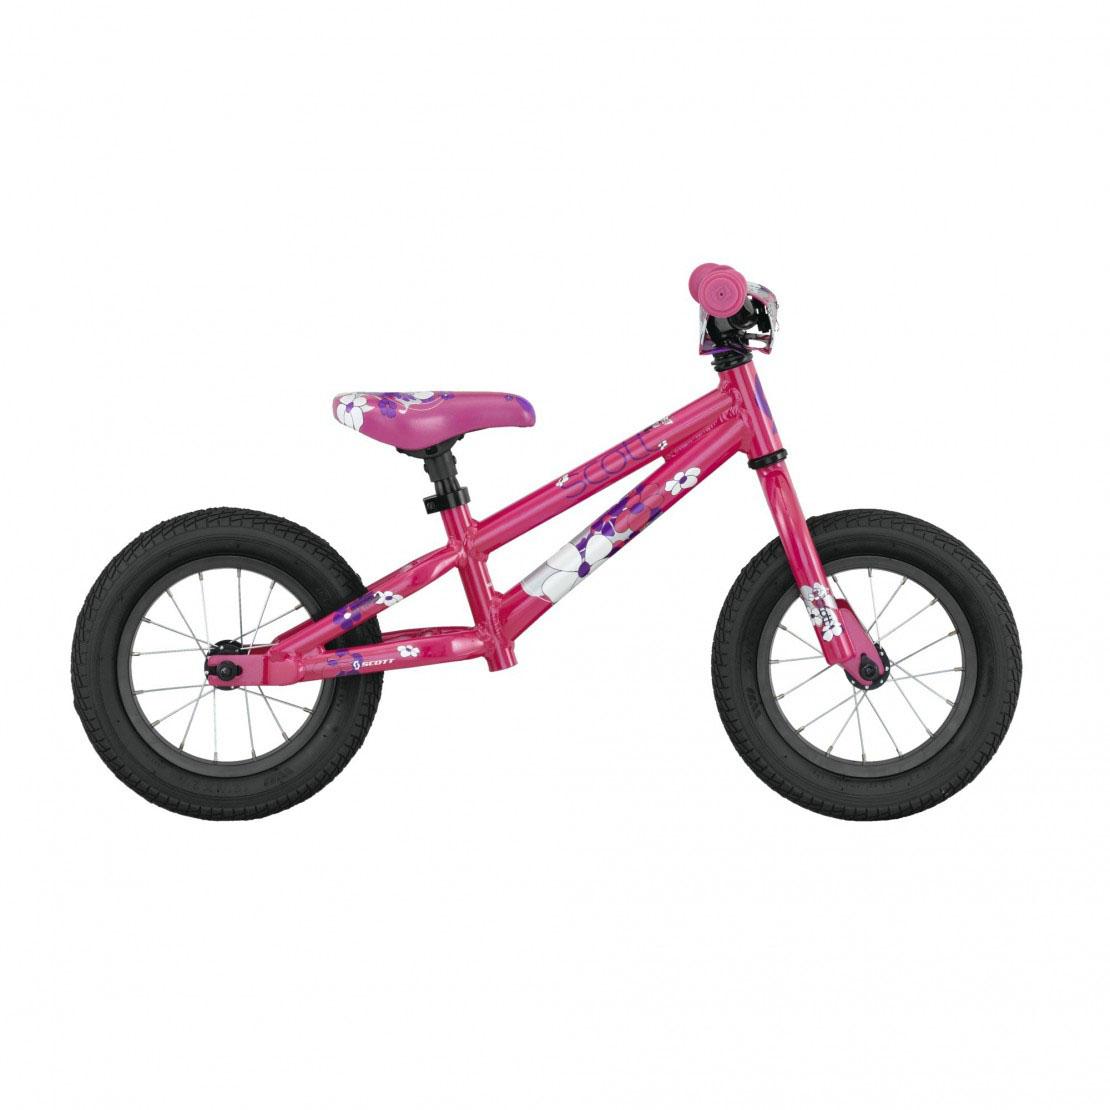 Scott Contessa Walker 2015 - Girls Junior Kids Bike | Kids ...